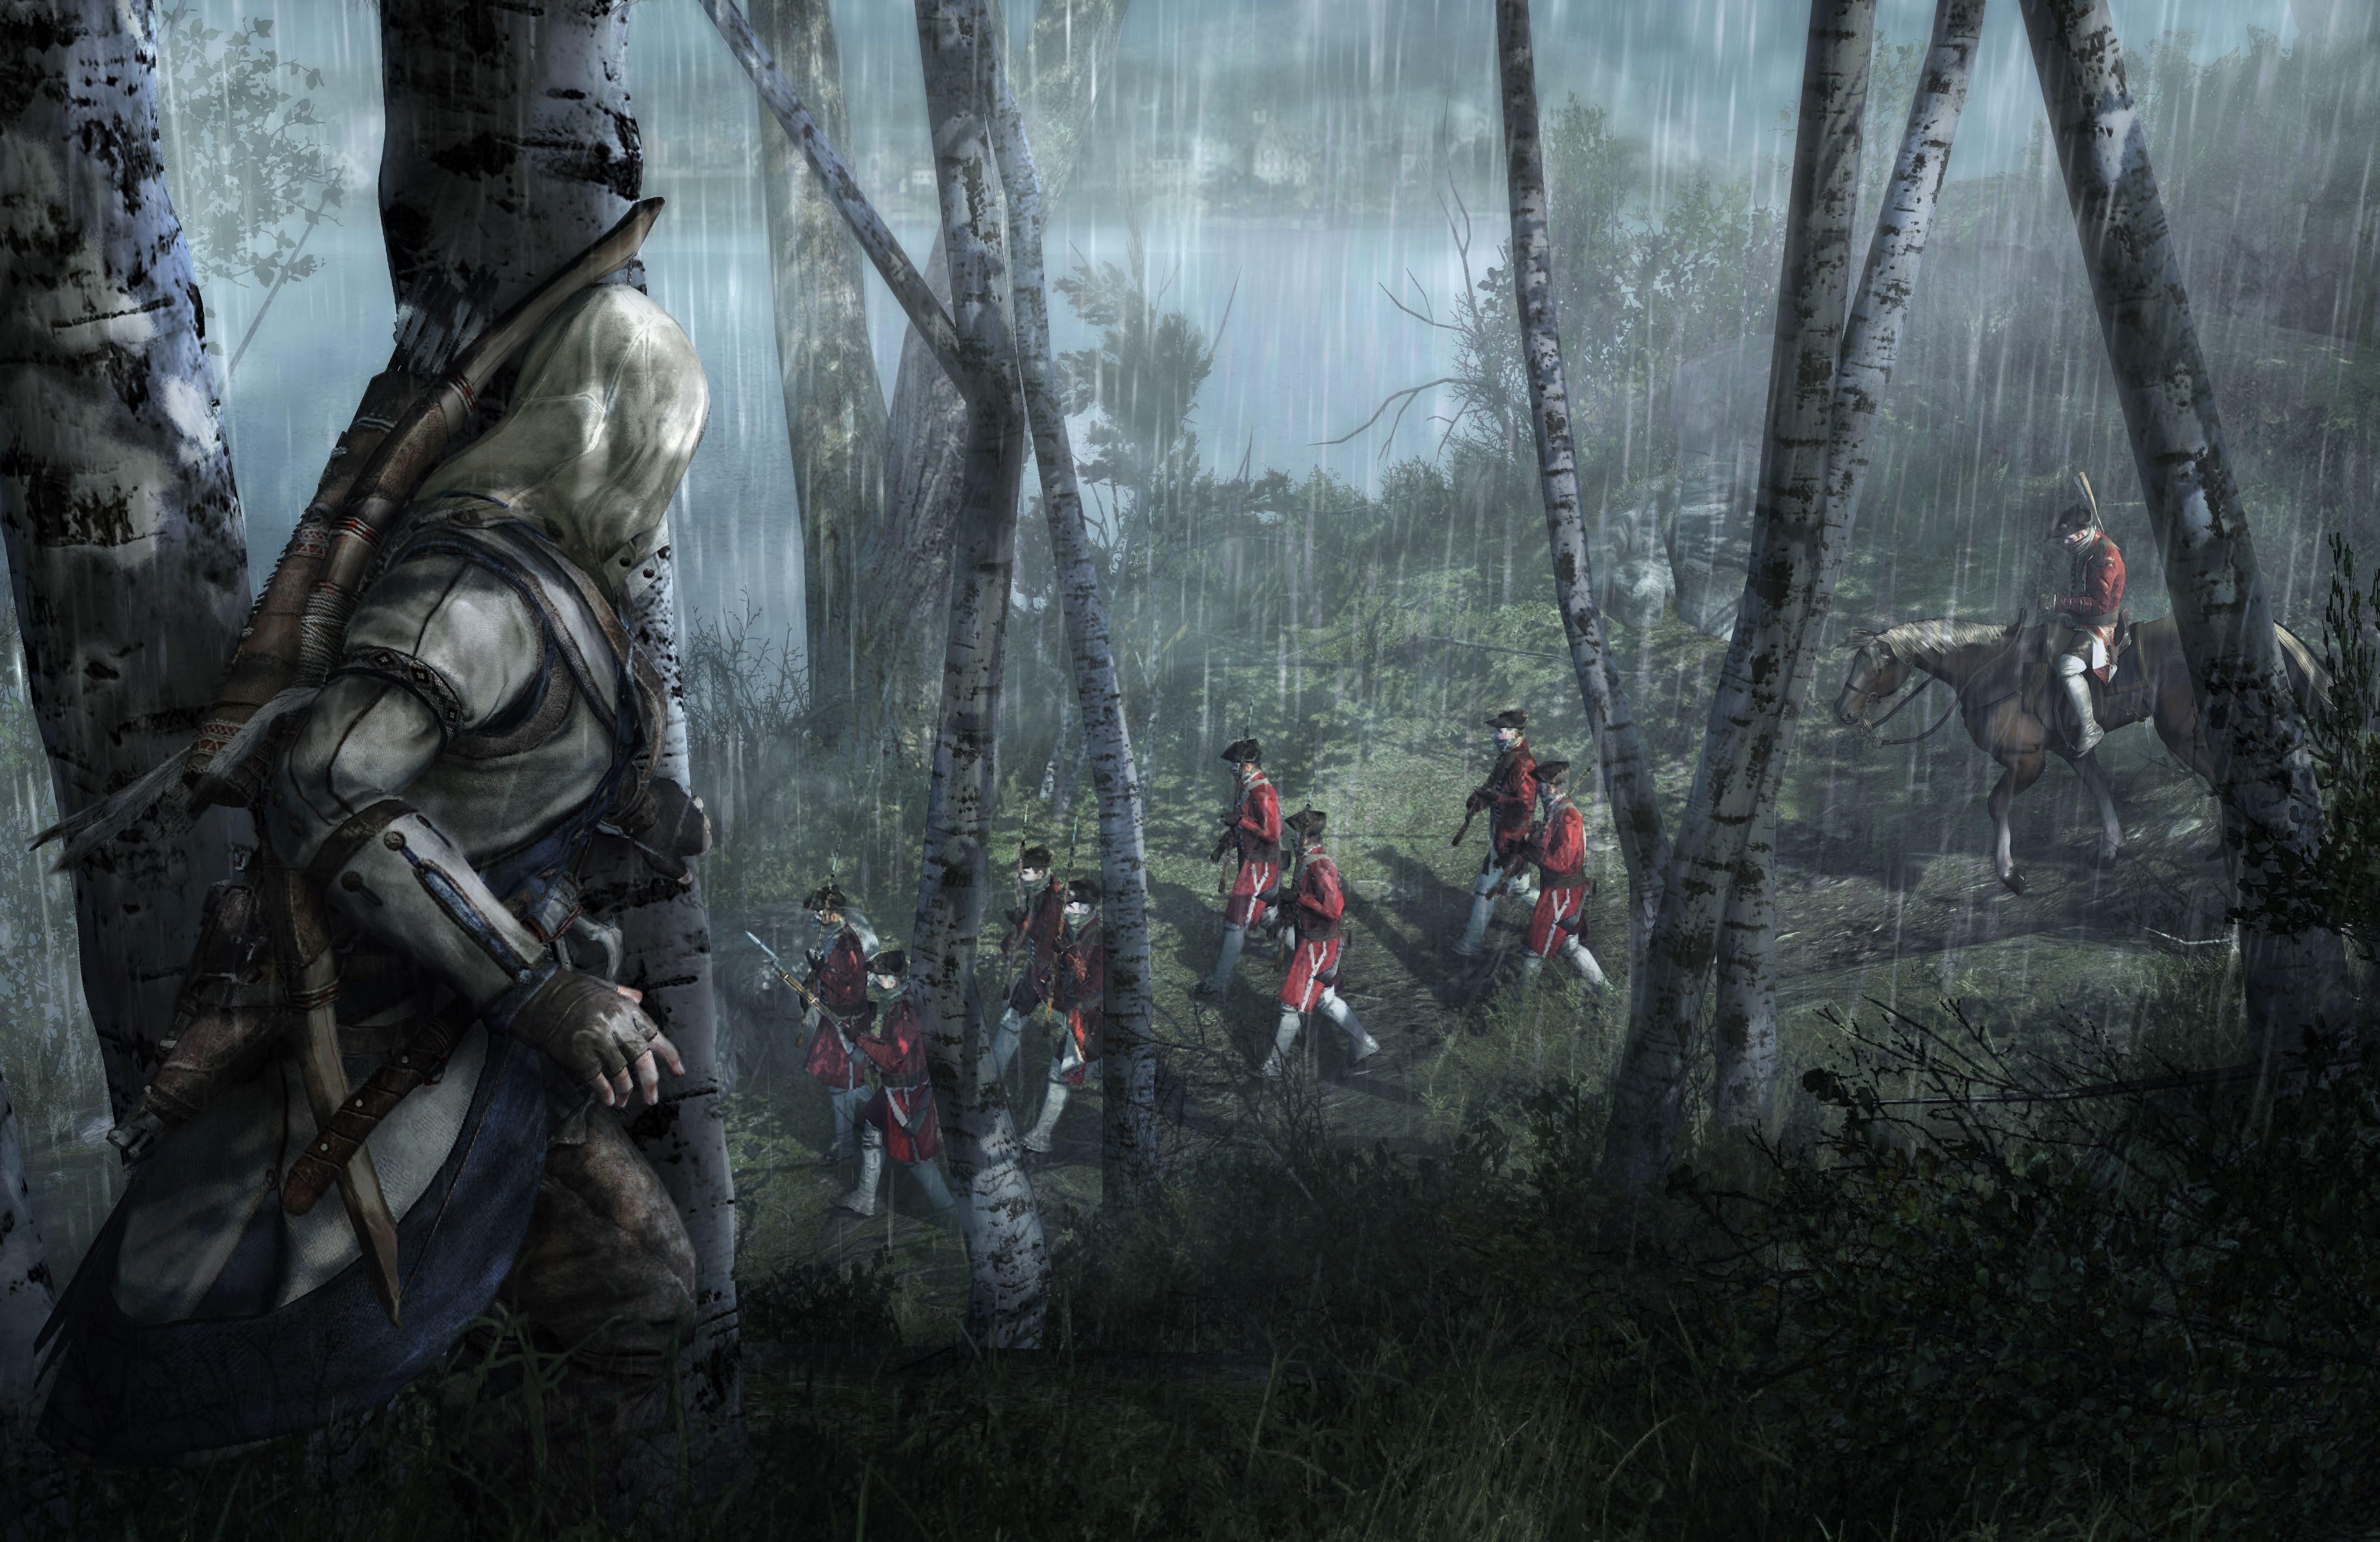 4k Wallpaper Assassins Creed Iii 4338x2811